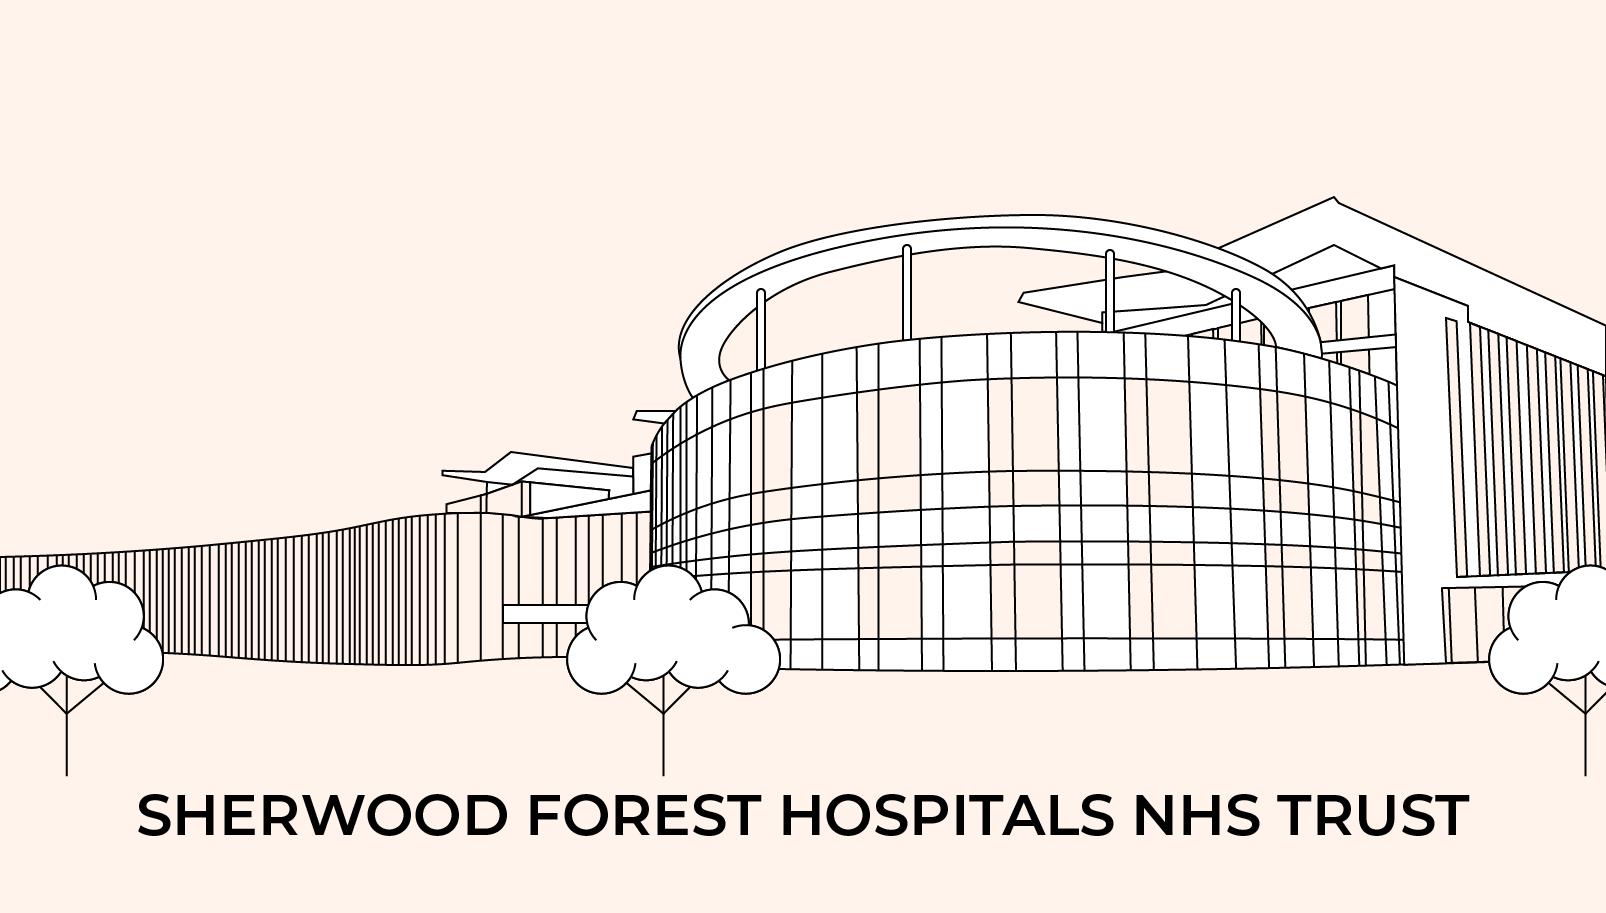 Sherwood Forest Hospitals NHS Trust